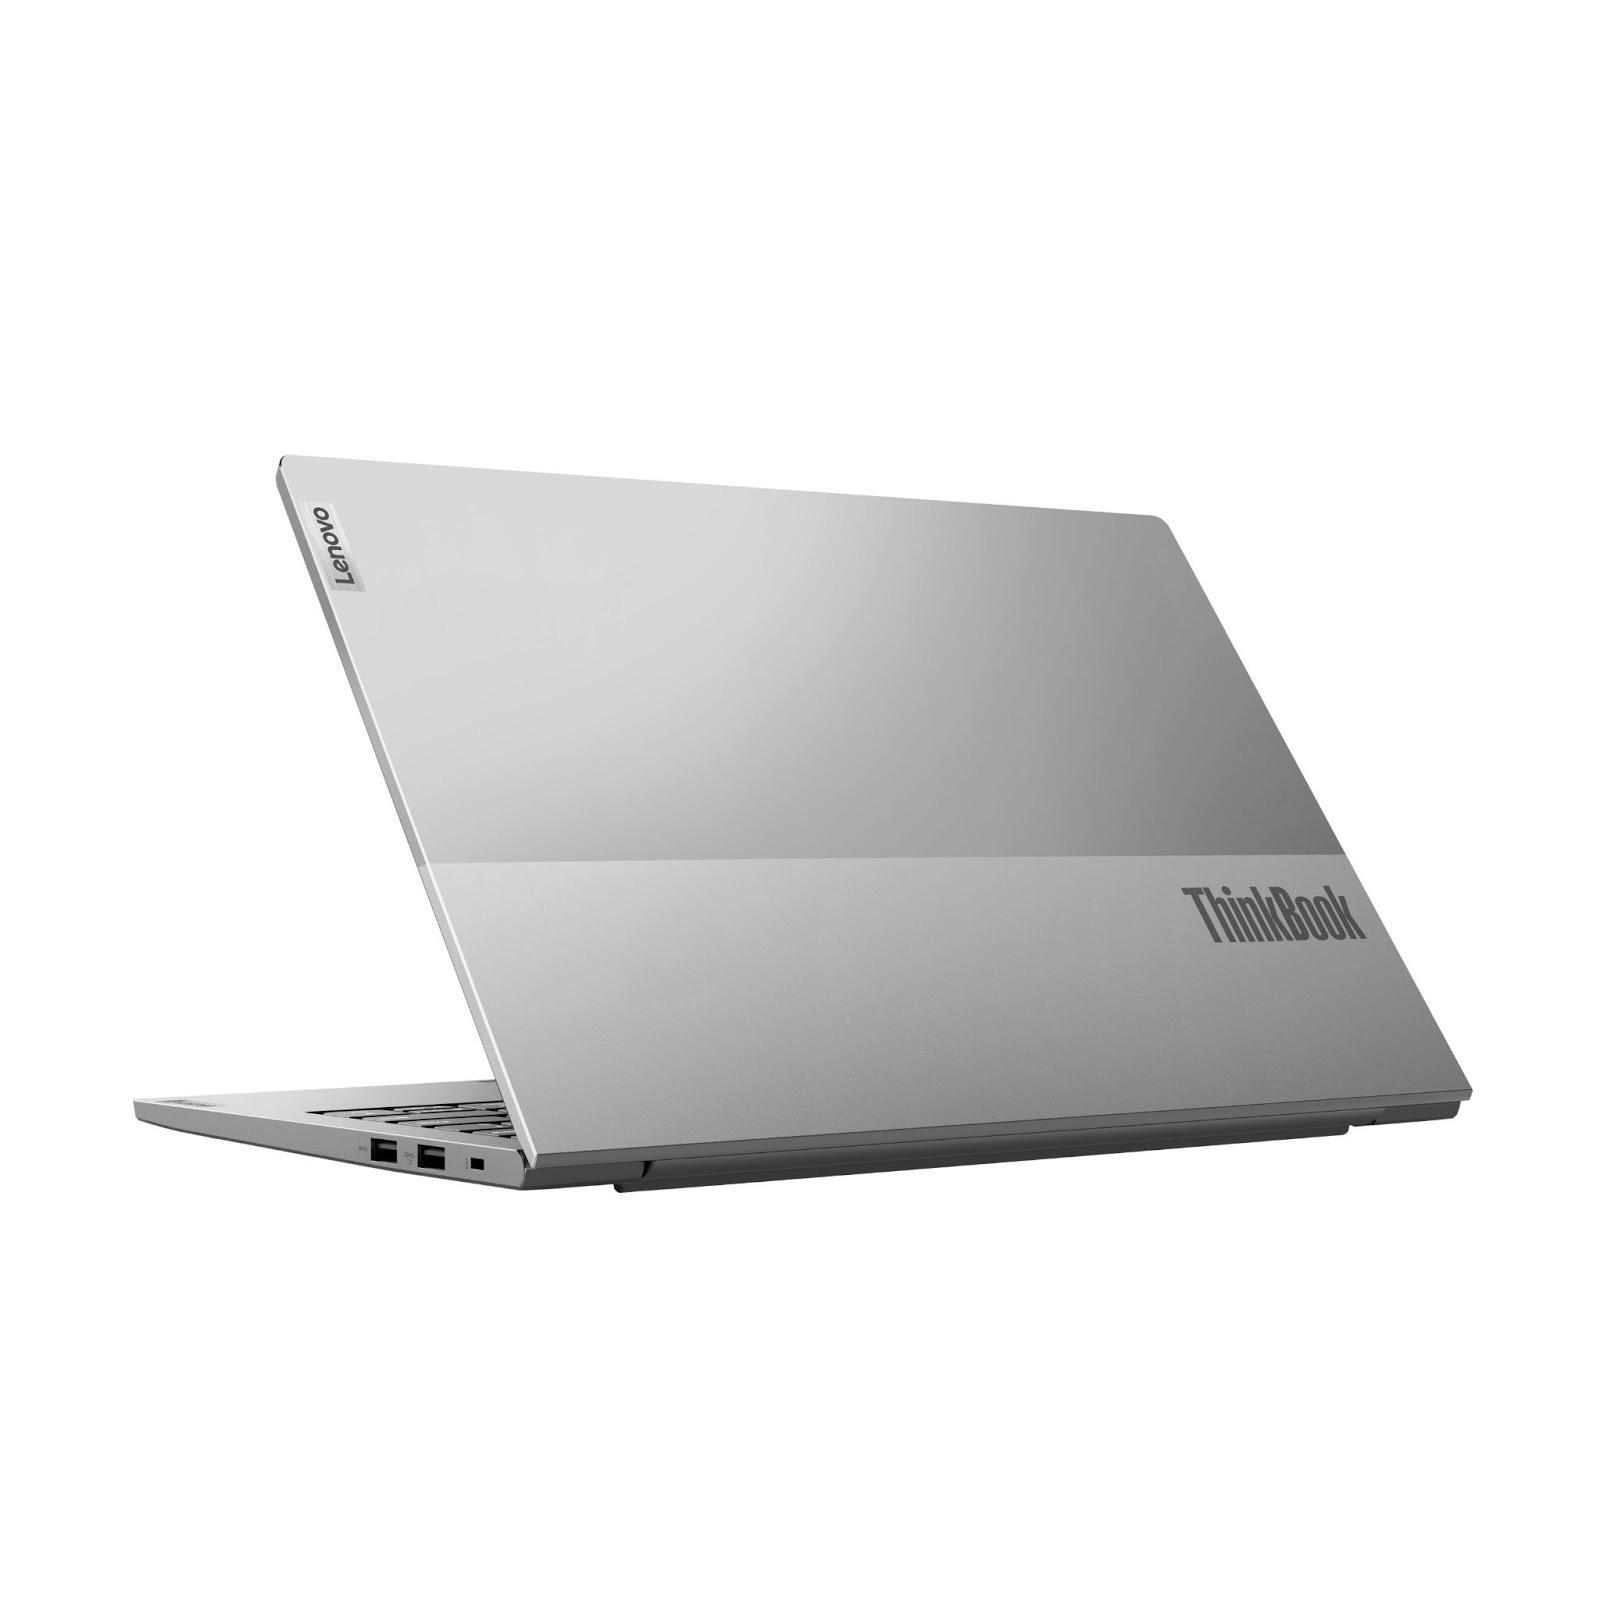 Фото 1. Ноутбук Lenovo ThinkBook 13s Gen 2 ITL (20V9003TRU)